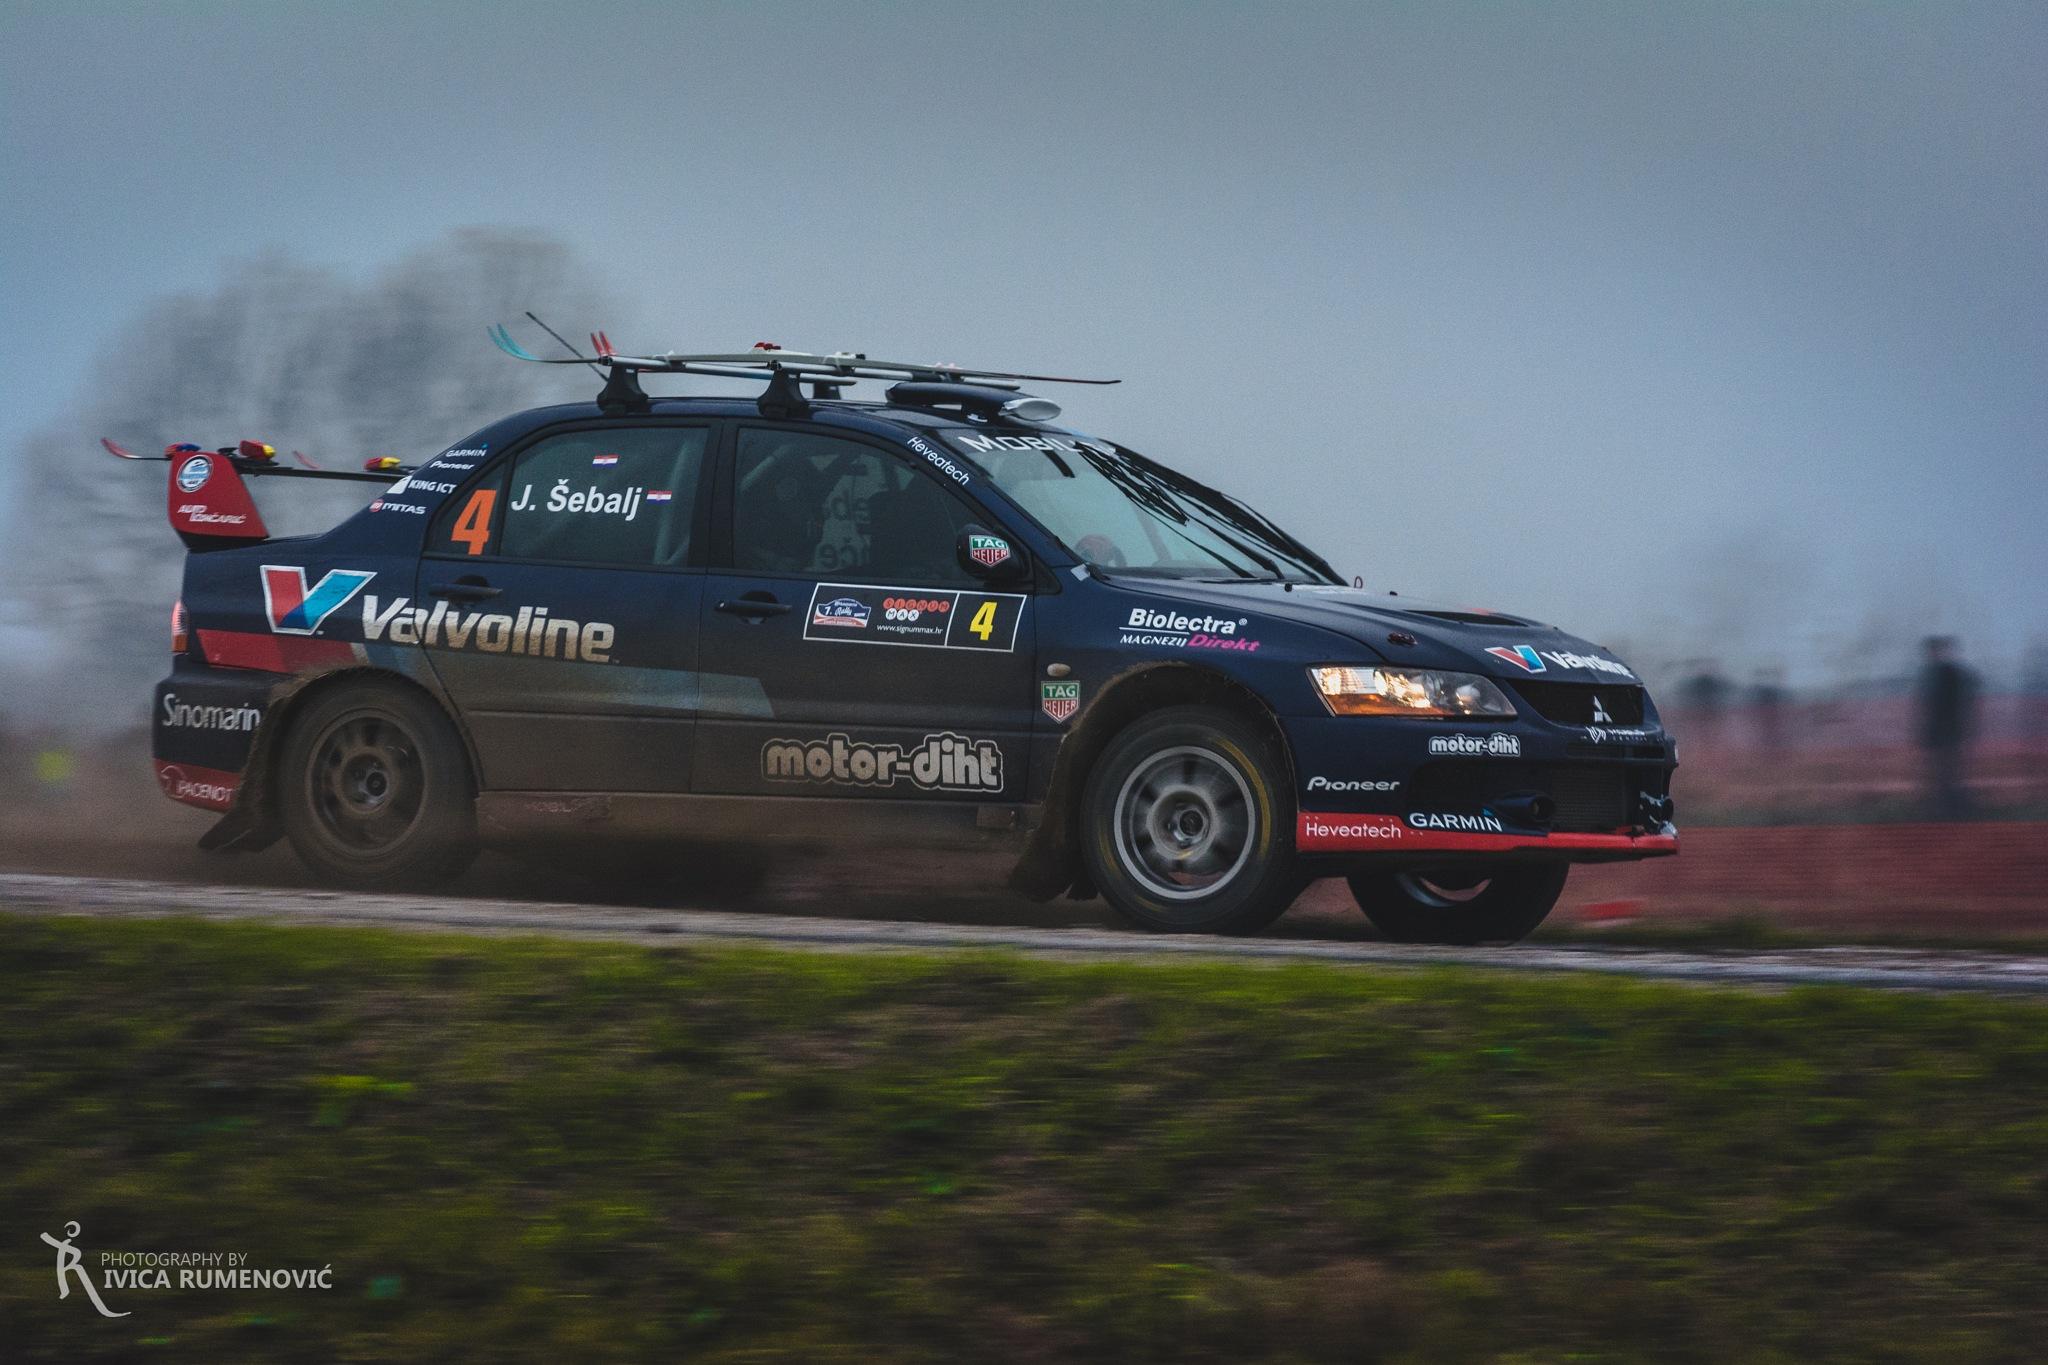 rally car by Rumenovic